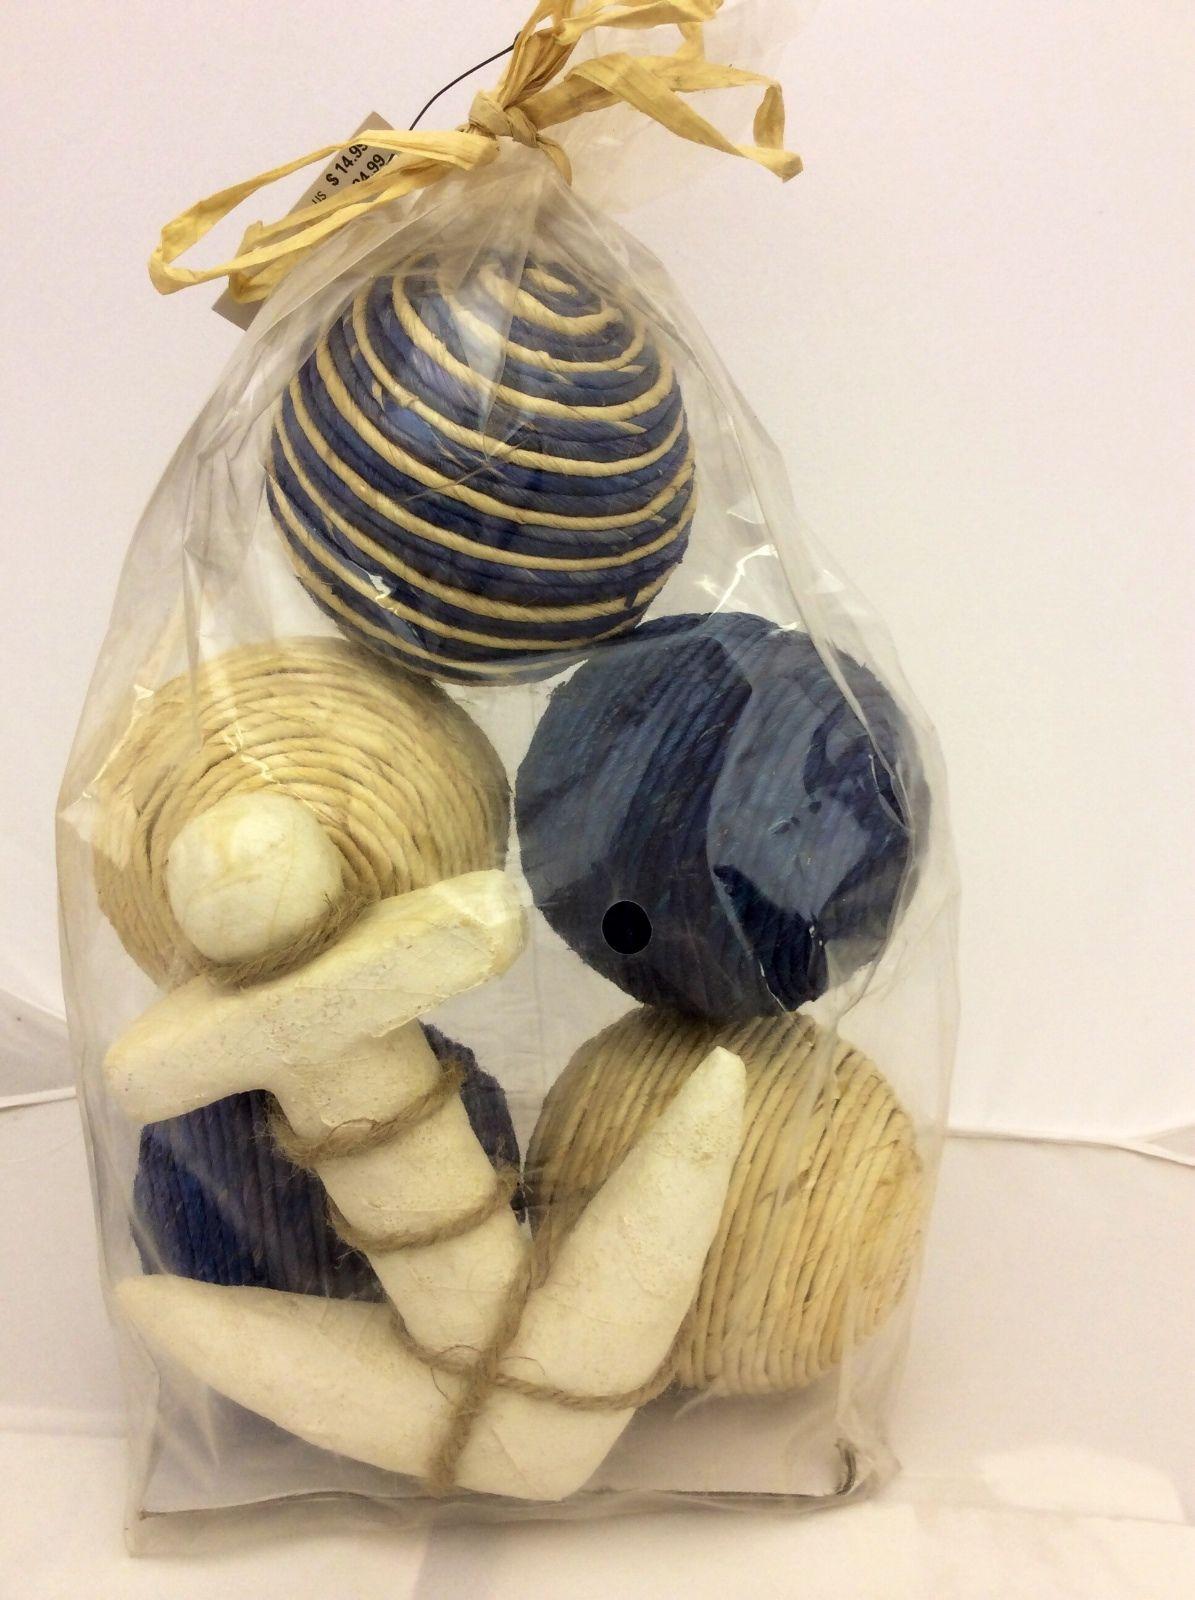 Decorative Rope Balls Sea Shoreline Set Of 5 Blue Natural Rope Balls Anchor Home